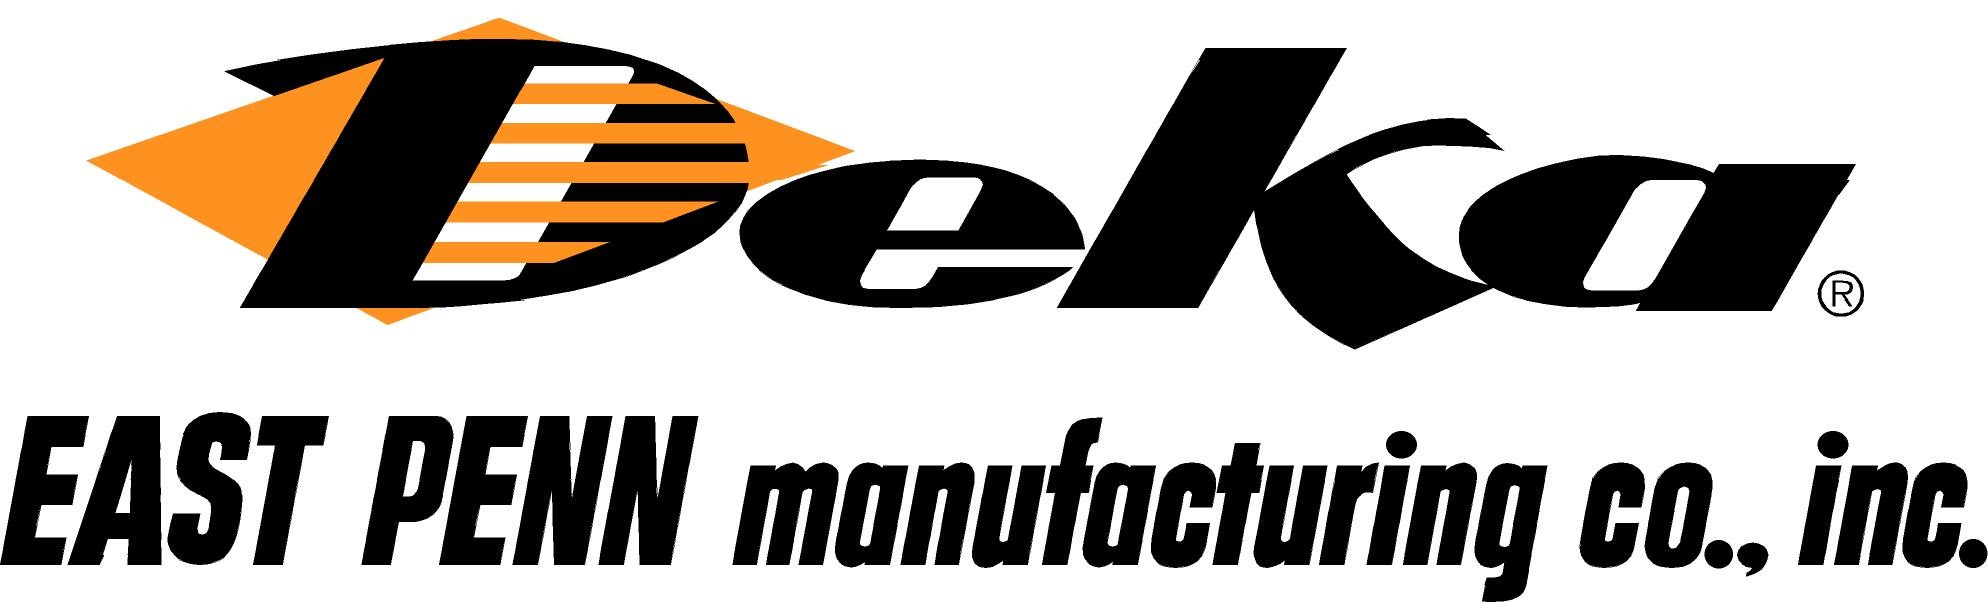 A logo of DEKA East Penn Manufacturing. DEKA East Penn Manufacturing is a private company and the world's largest single-site, lead-acid battery facility.